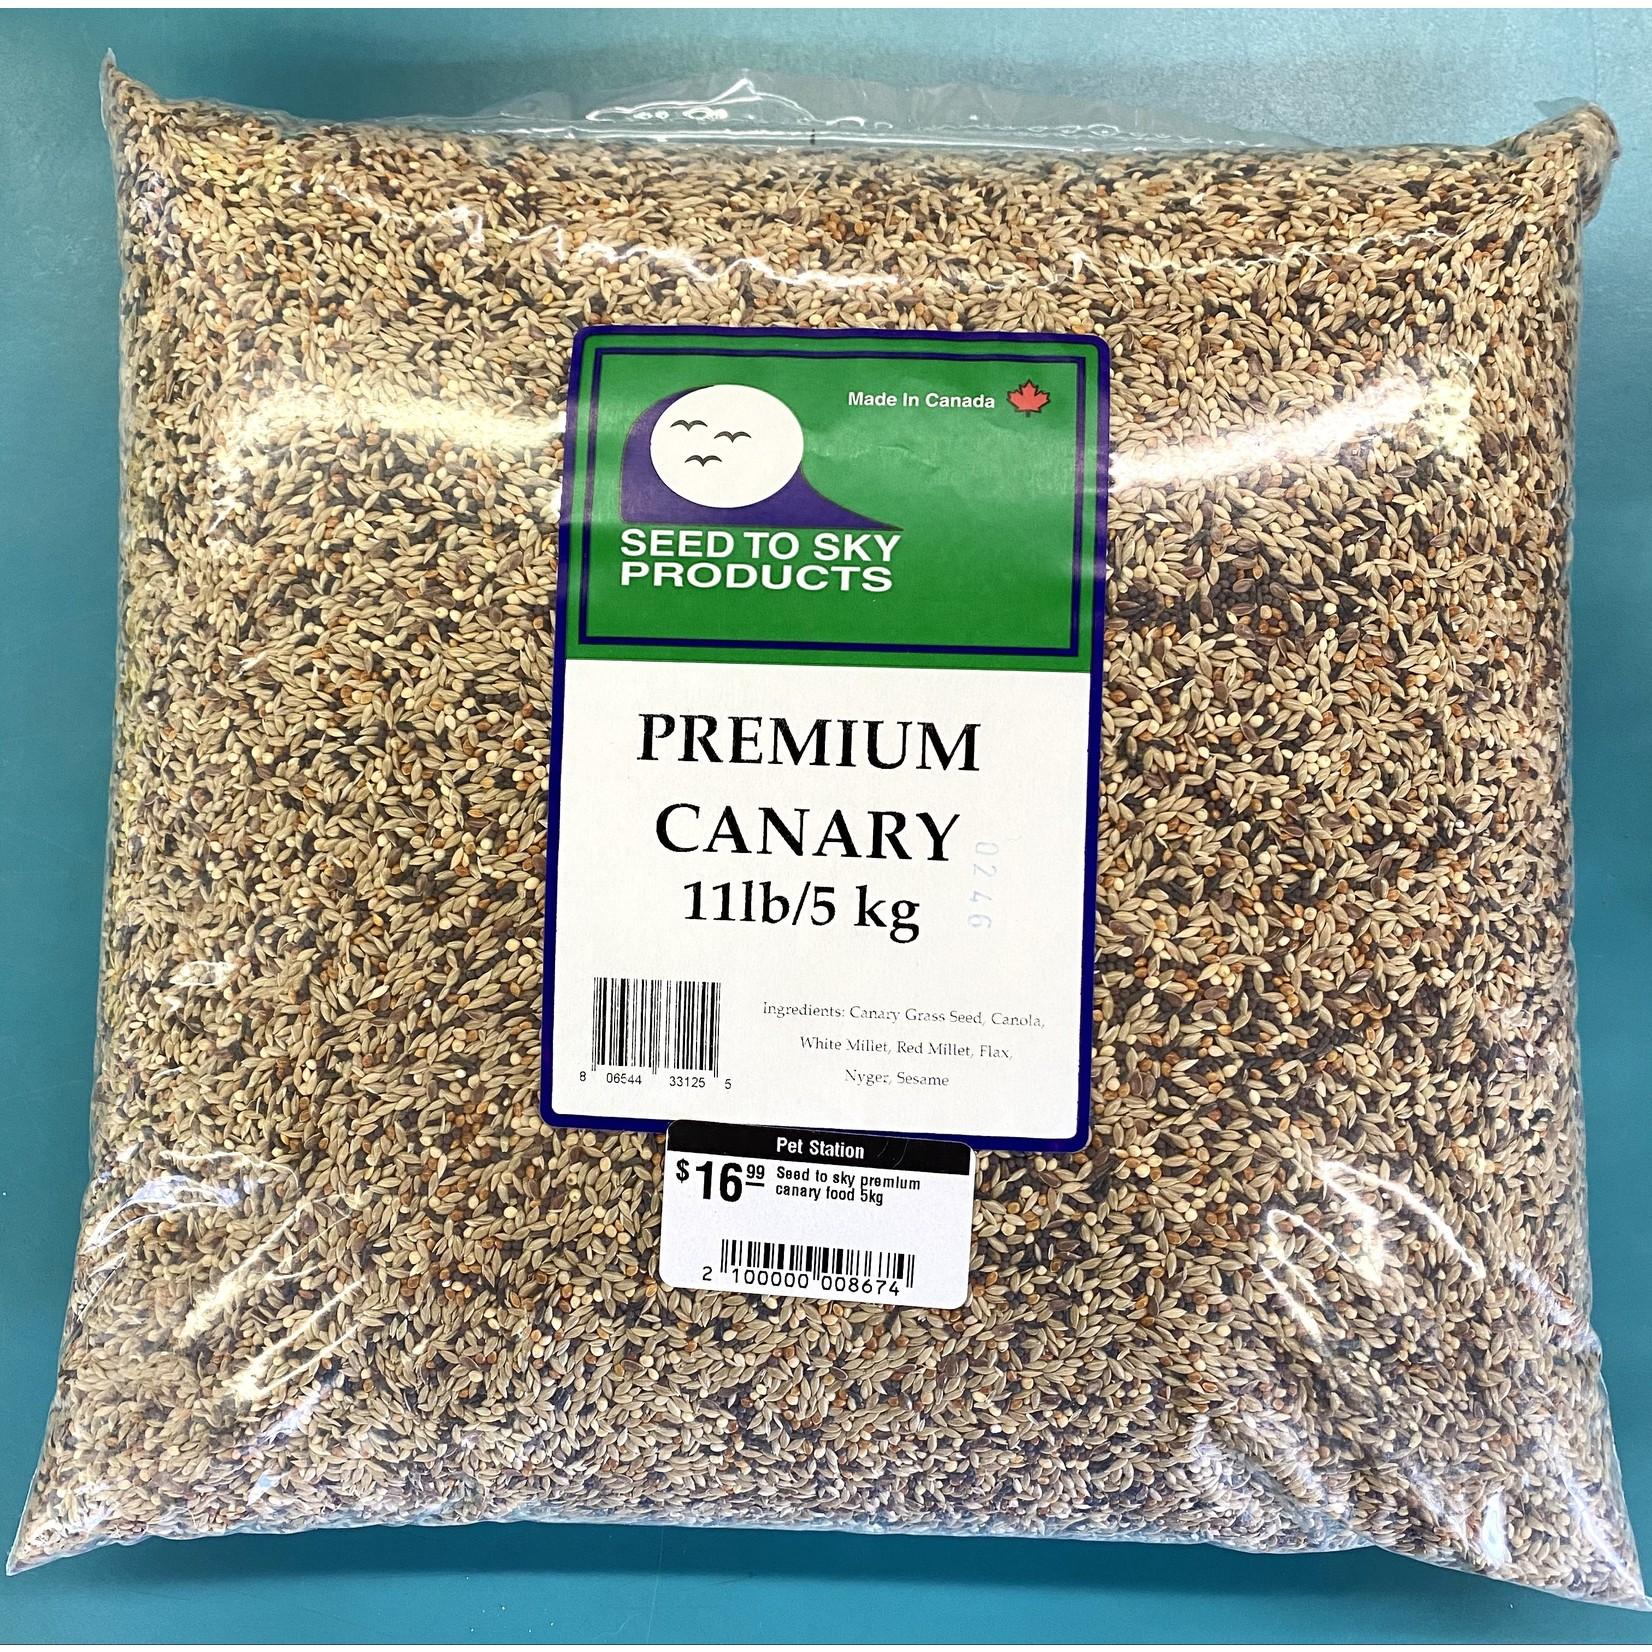 seed to sky Seed to sky Premium Canary